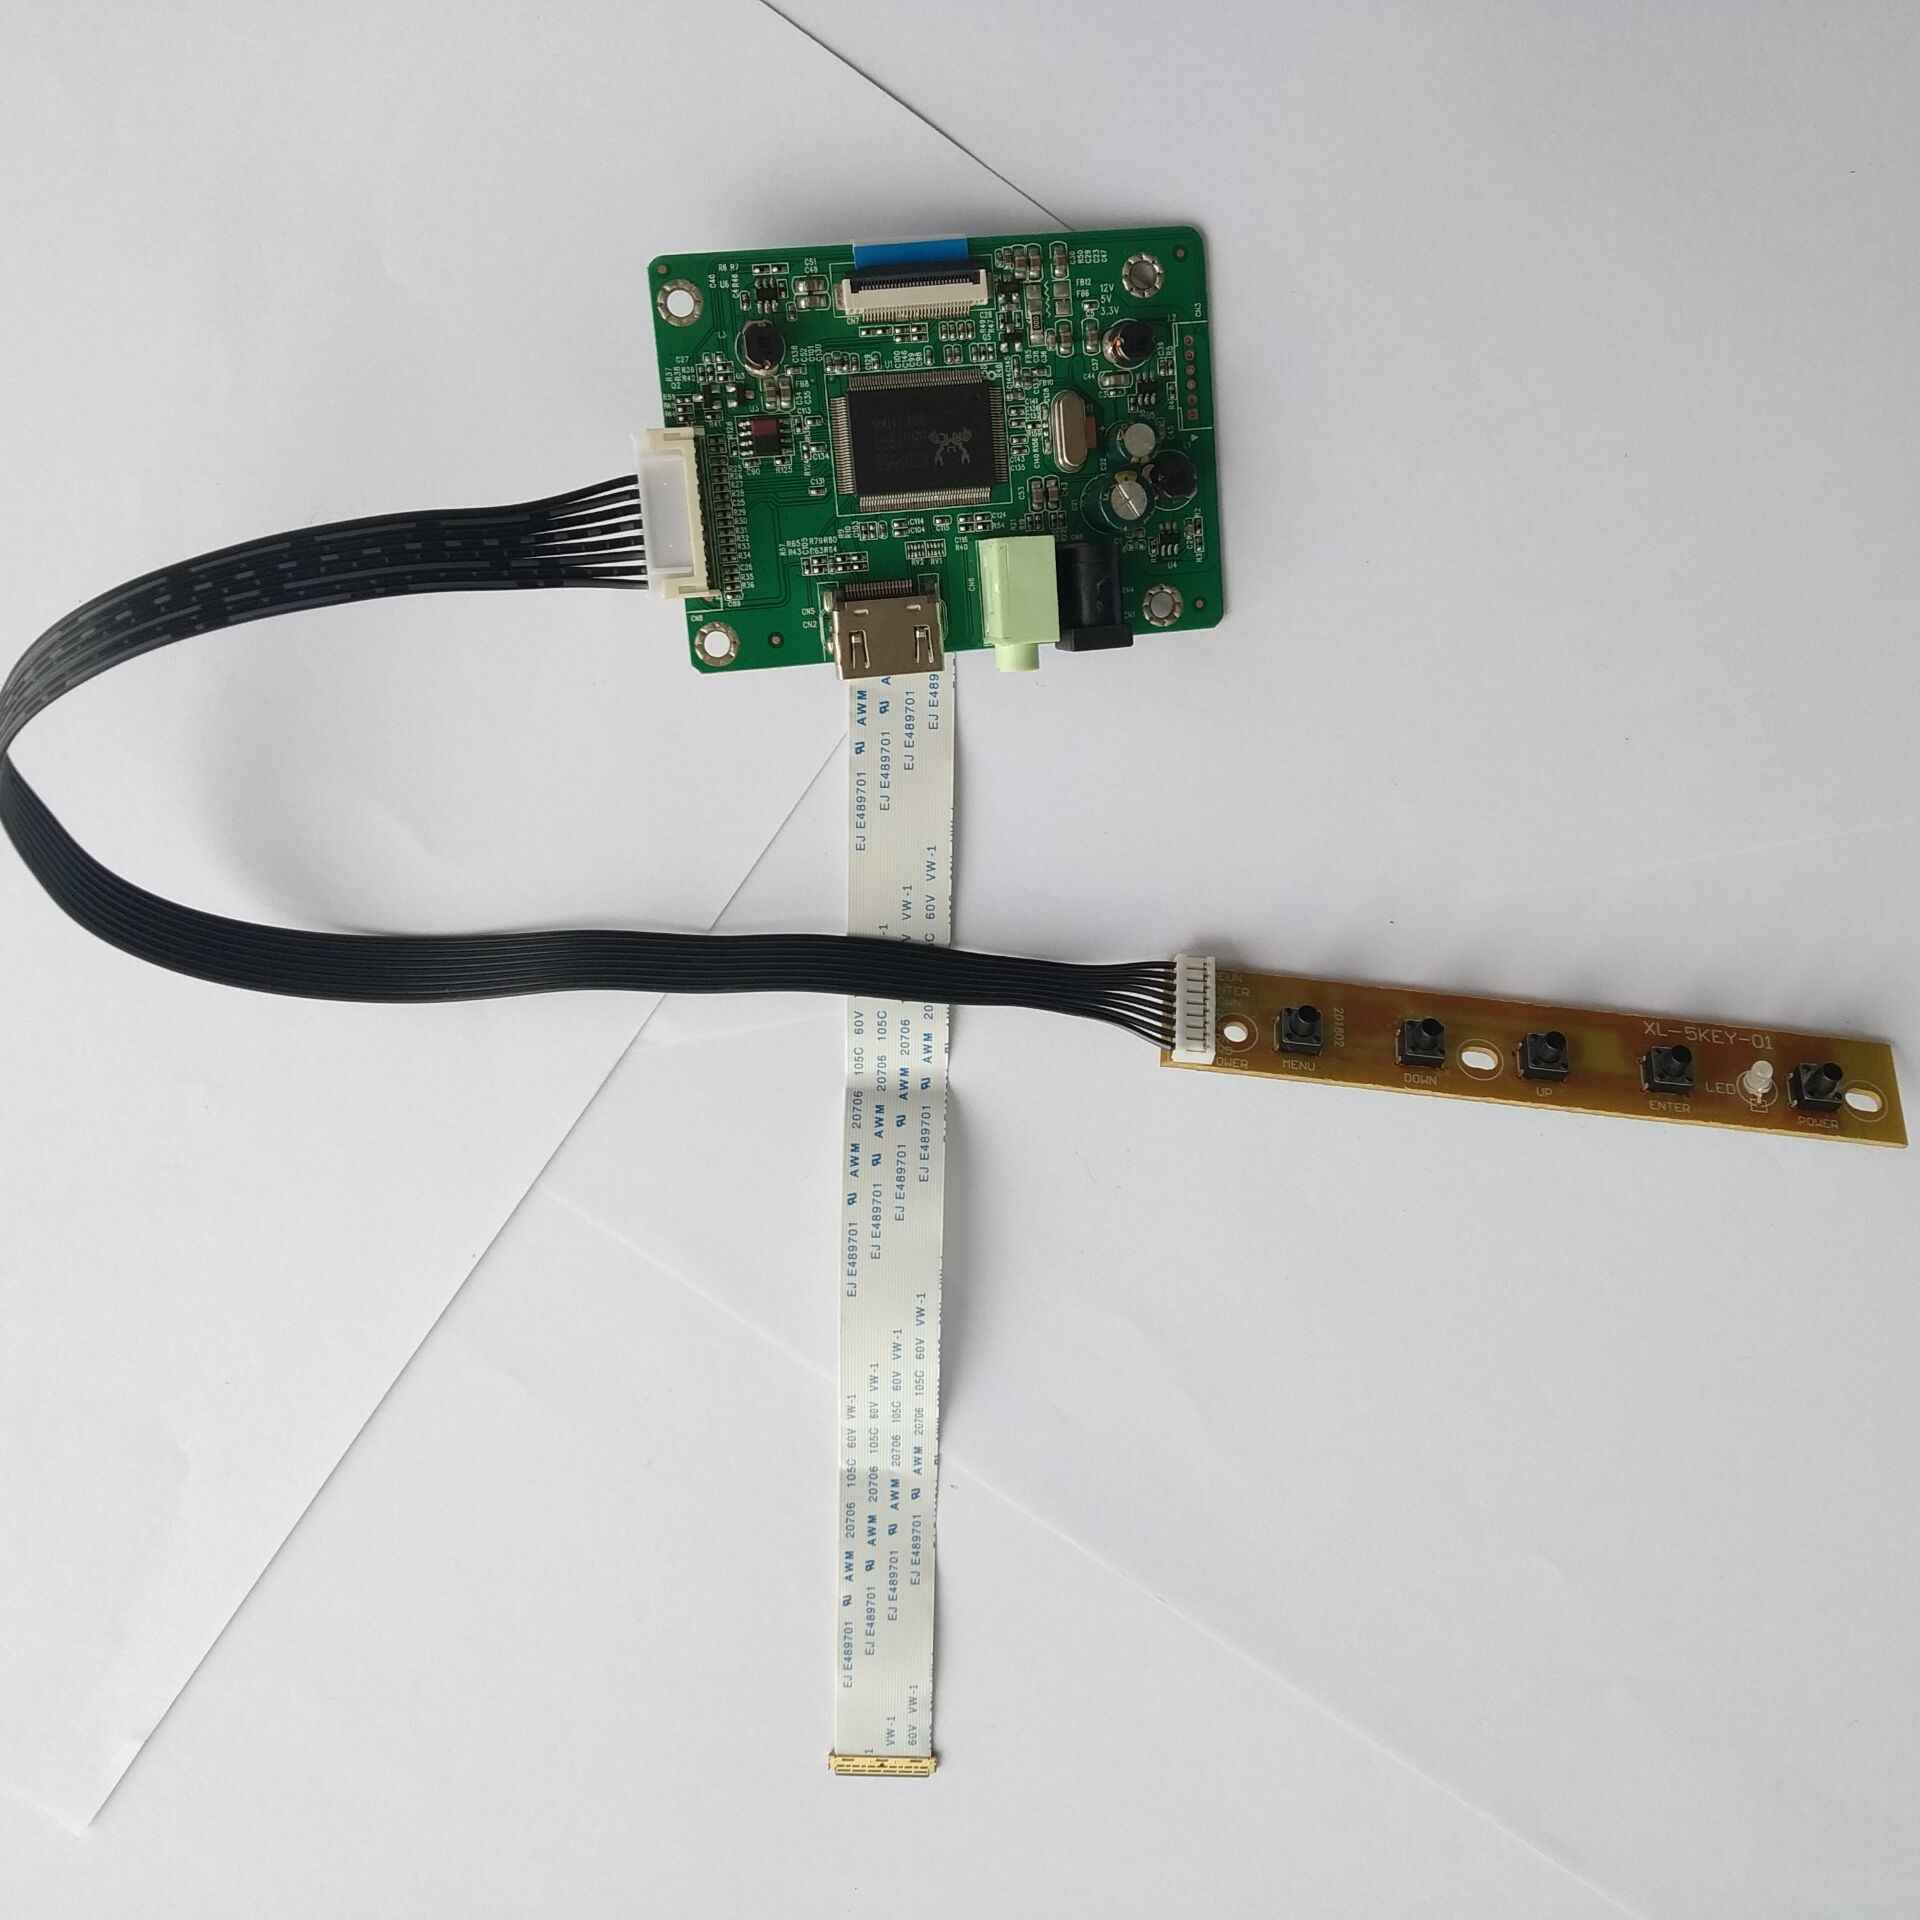 Dla NV140FHM-N41/NV140FHM-N43 1920X1080 panel monitora HDMI LCD LED EDP mini zestaw sterowniczy 30pin kabel karty